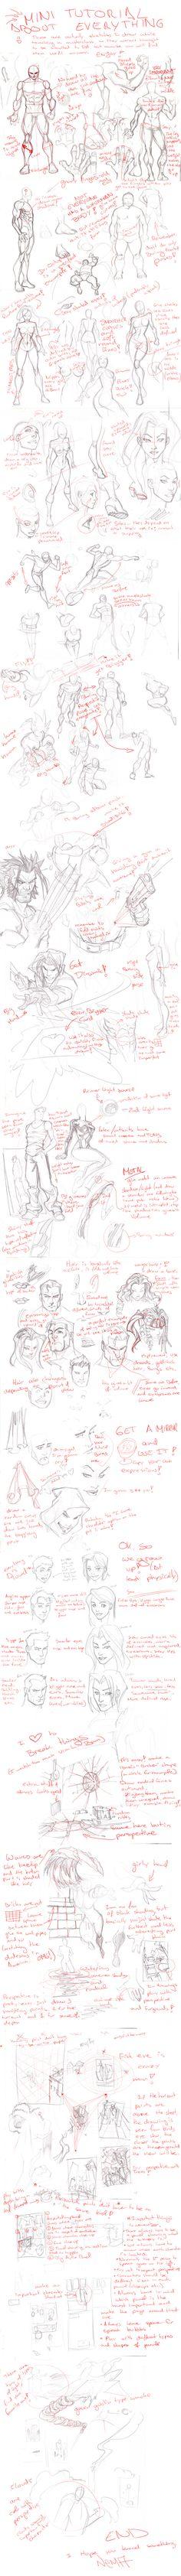 mini tutori, comic books, comic tutorial